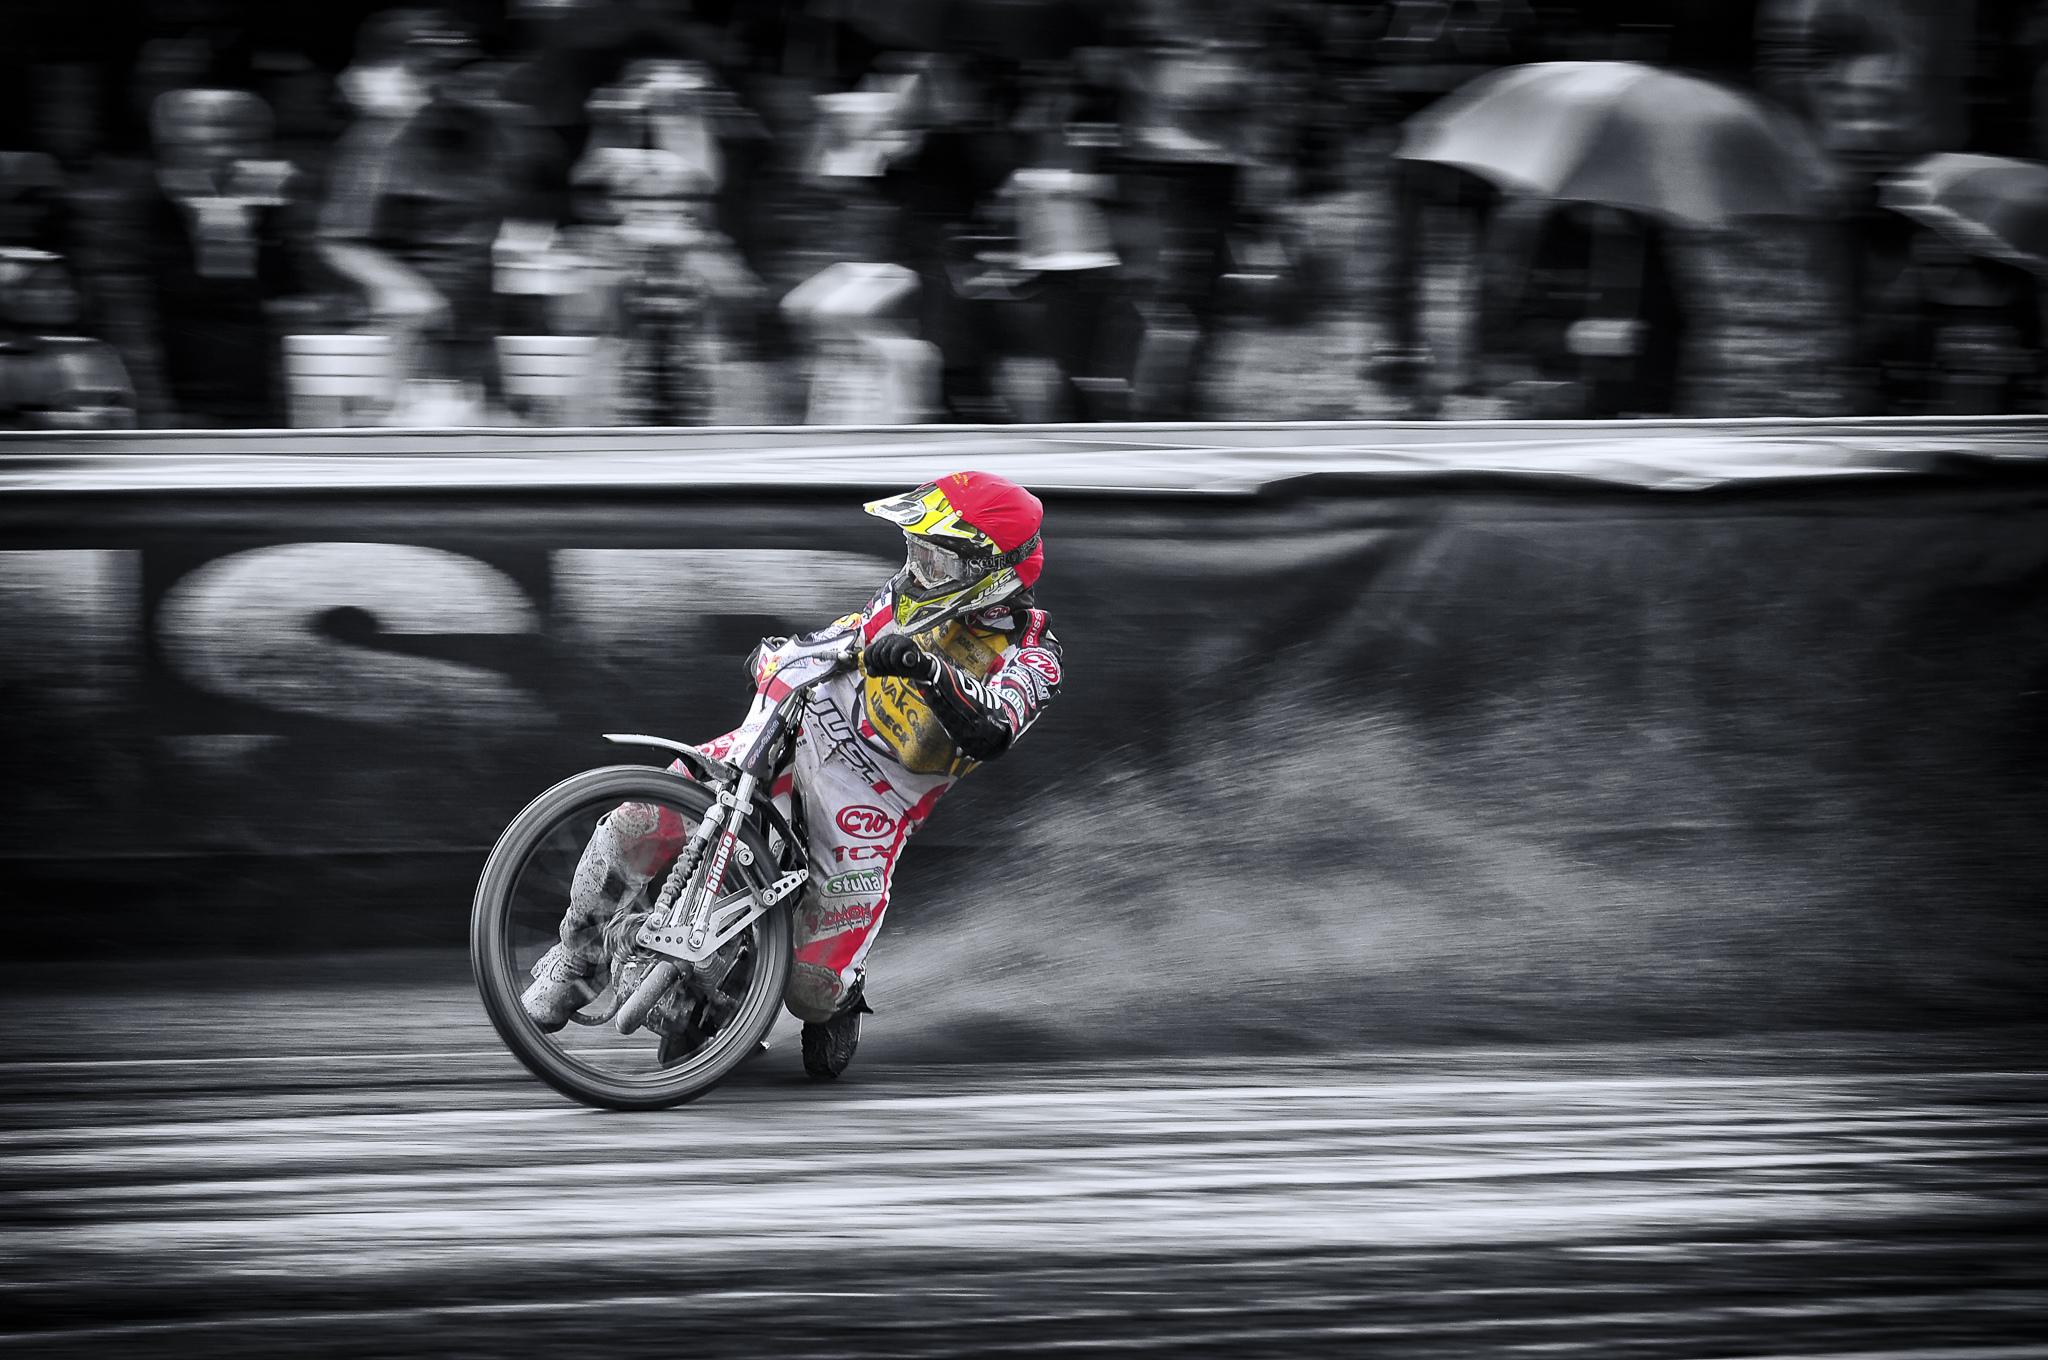 Motocross: Motorcycle, Motocross, Selective Color